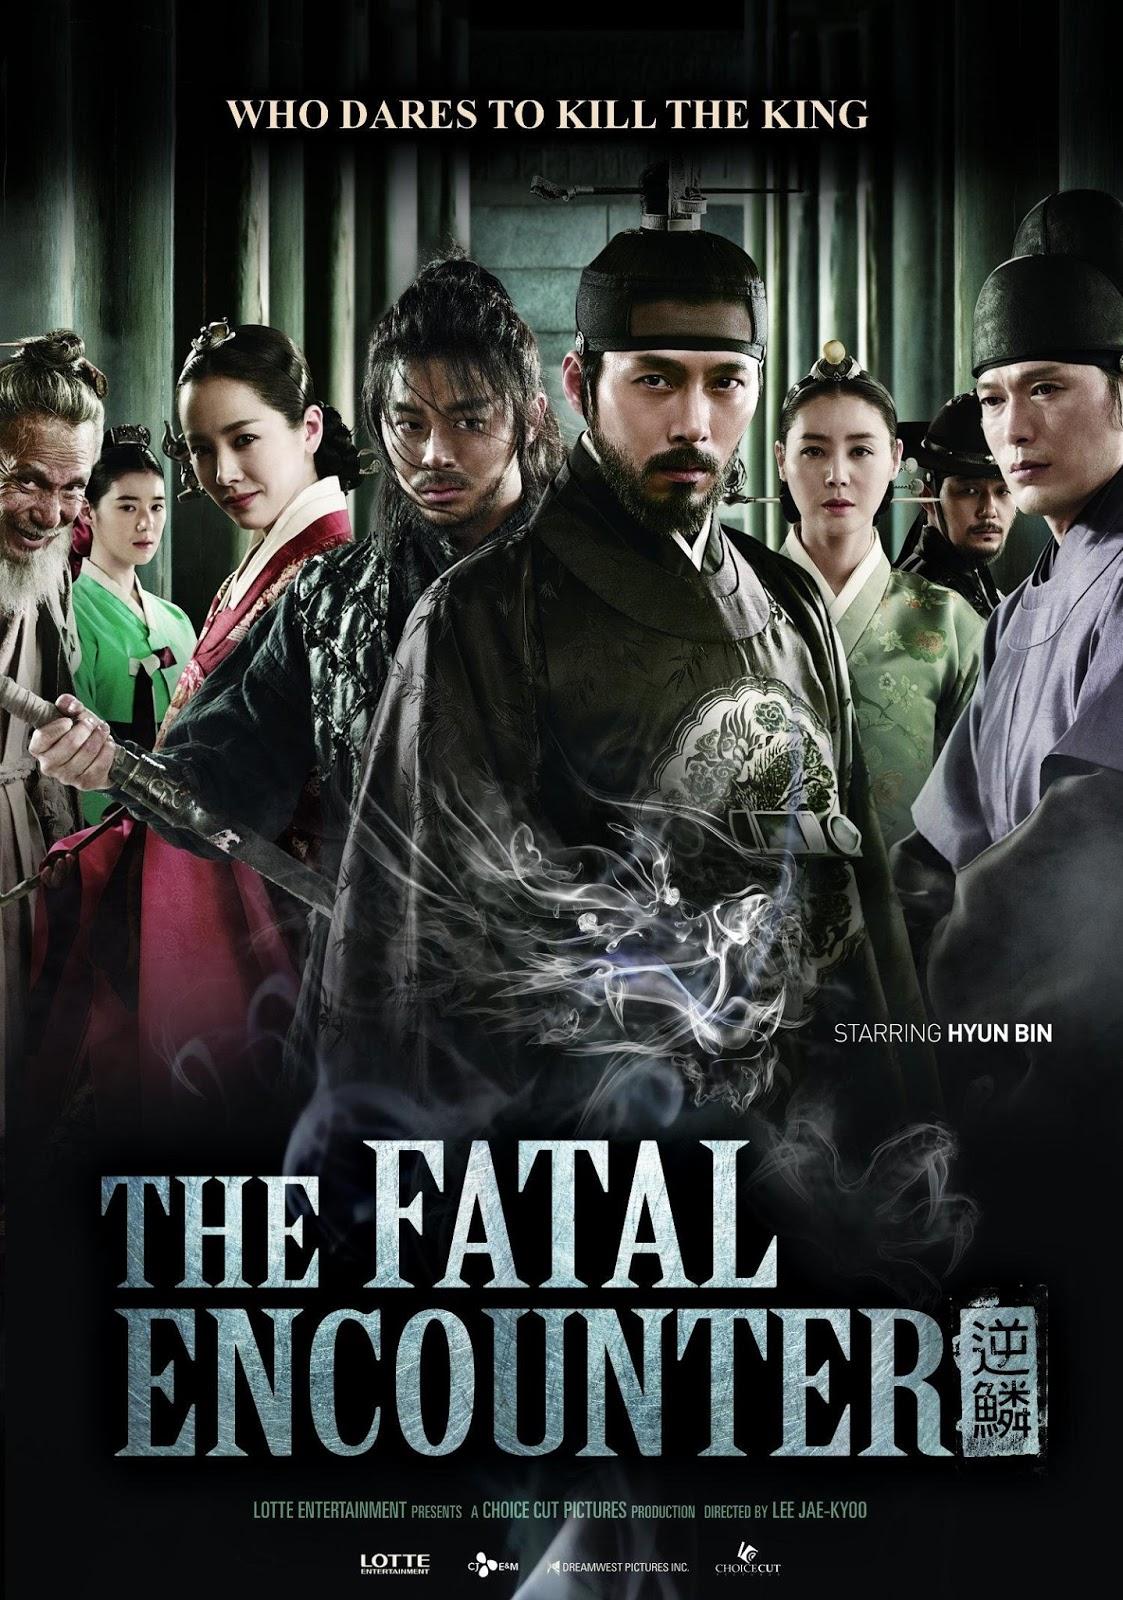 The Fatal Encounter พลิกแผนฆ่า โค่นบัลลังก์ [HD][พากย์ไทย]